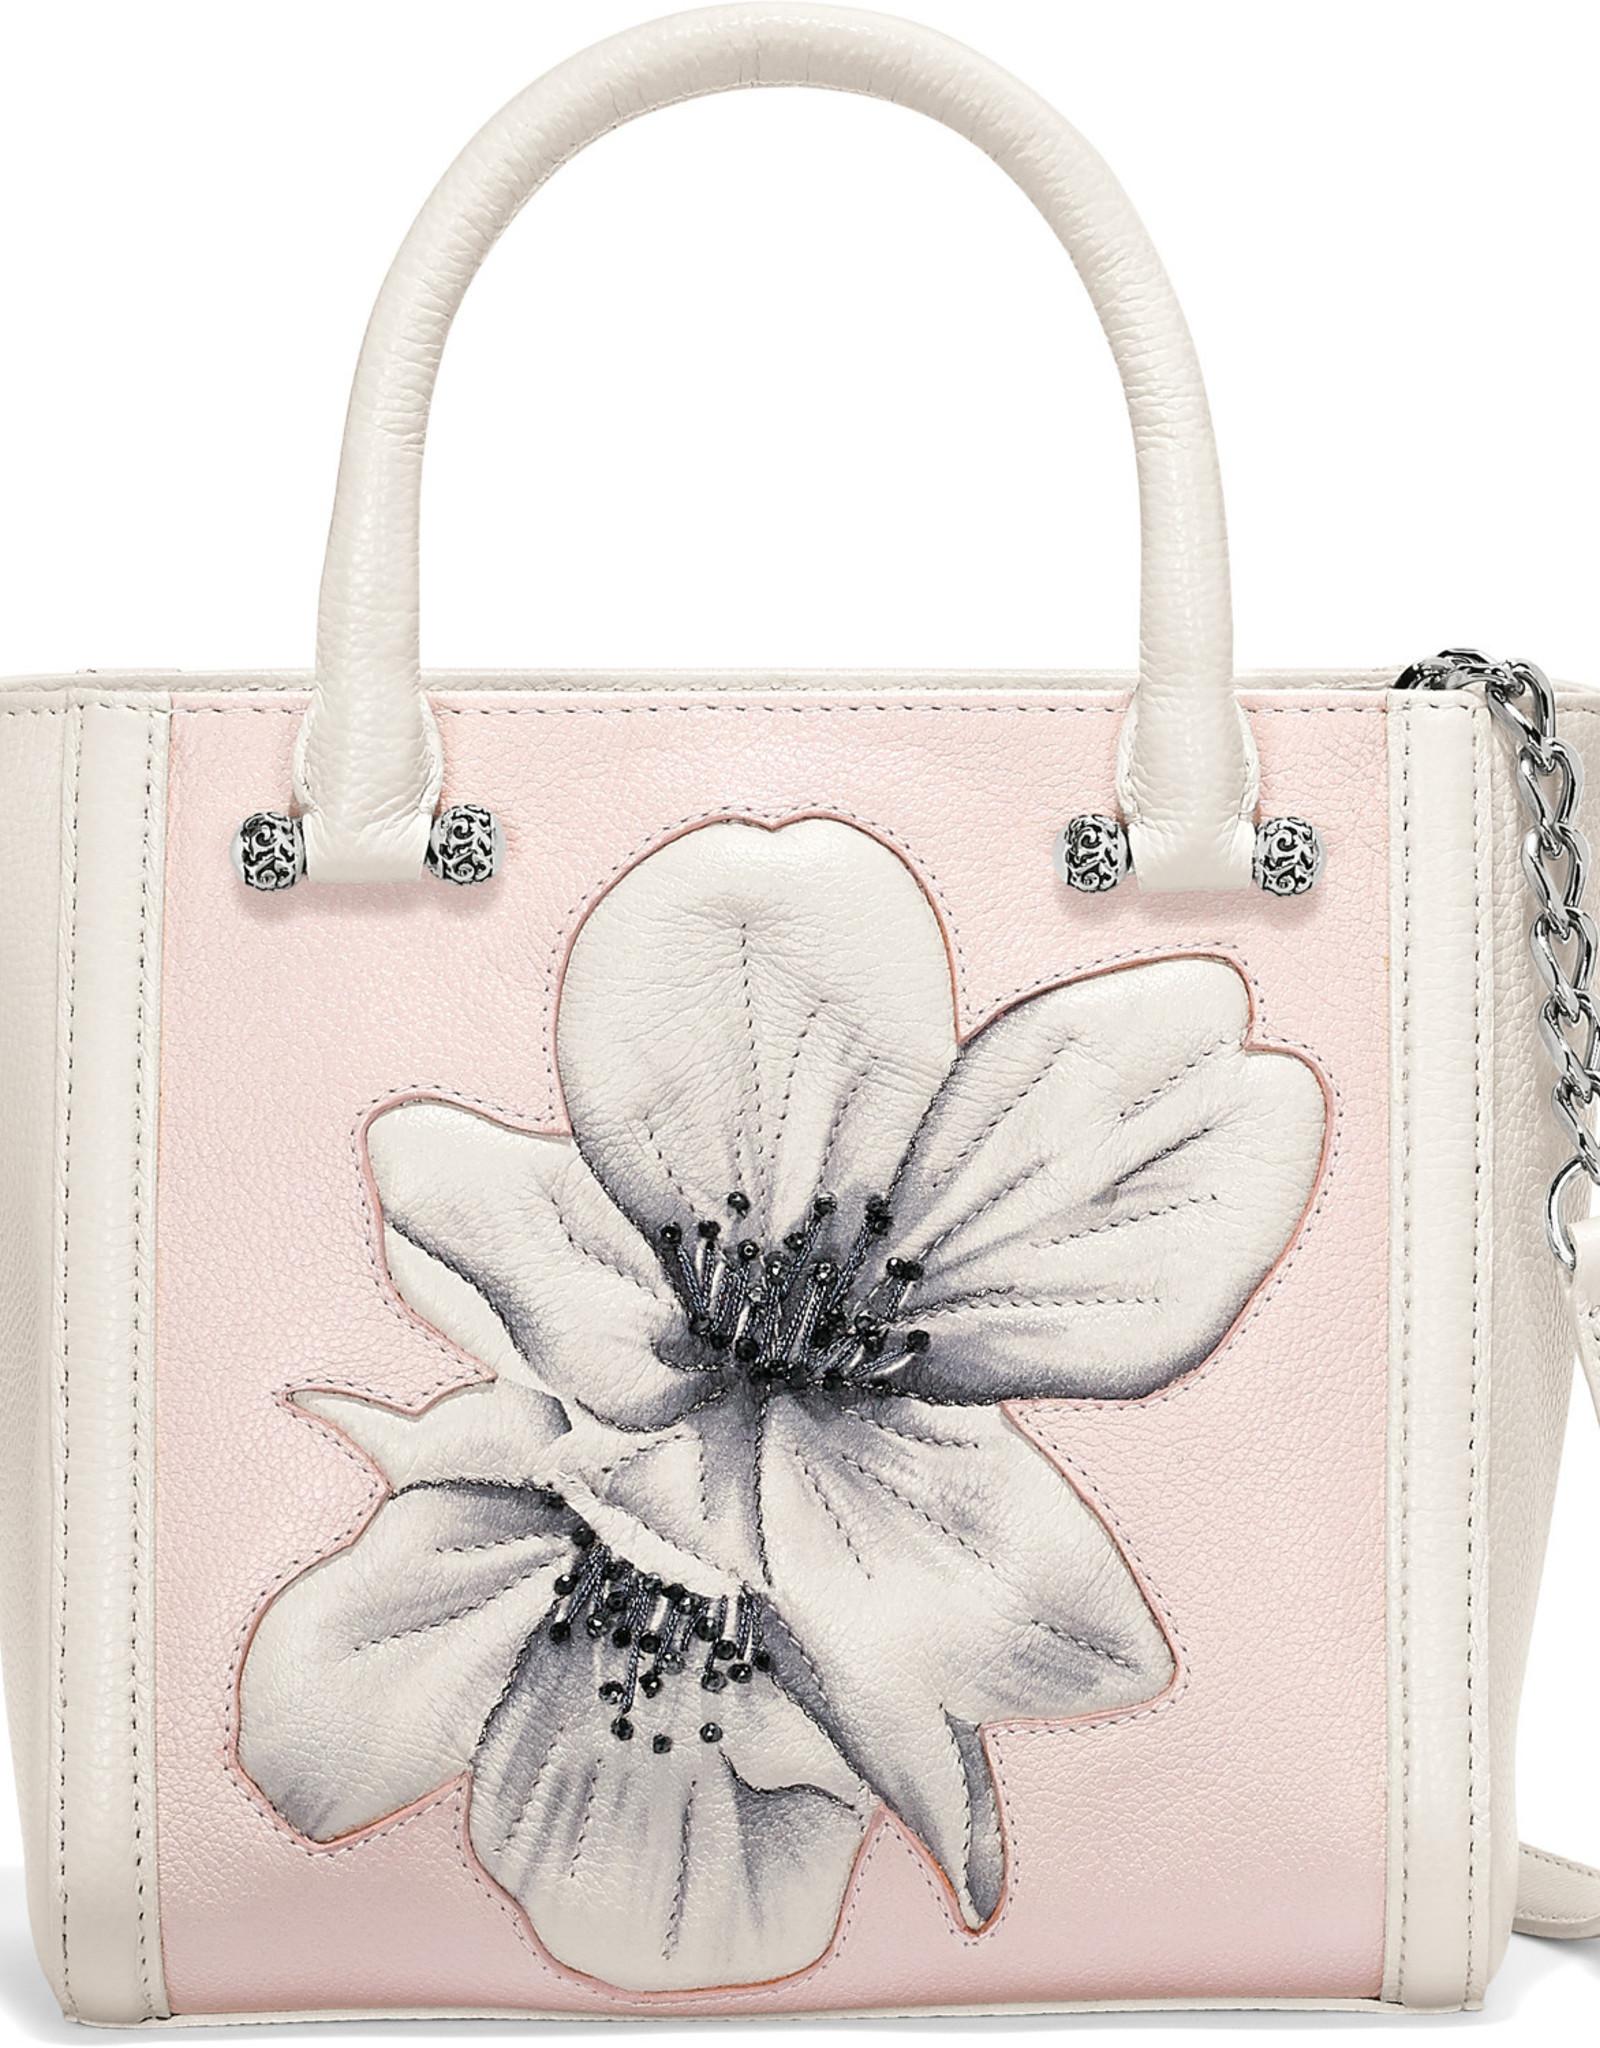 Brighton Brighton Handbag Alecia Convertible Tote White-Blush OS